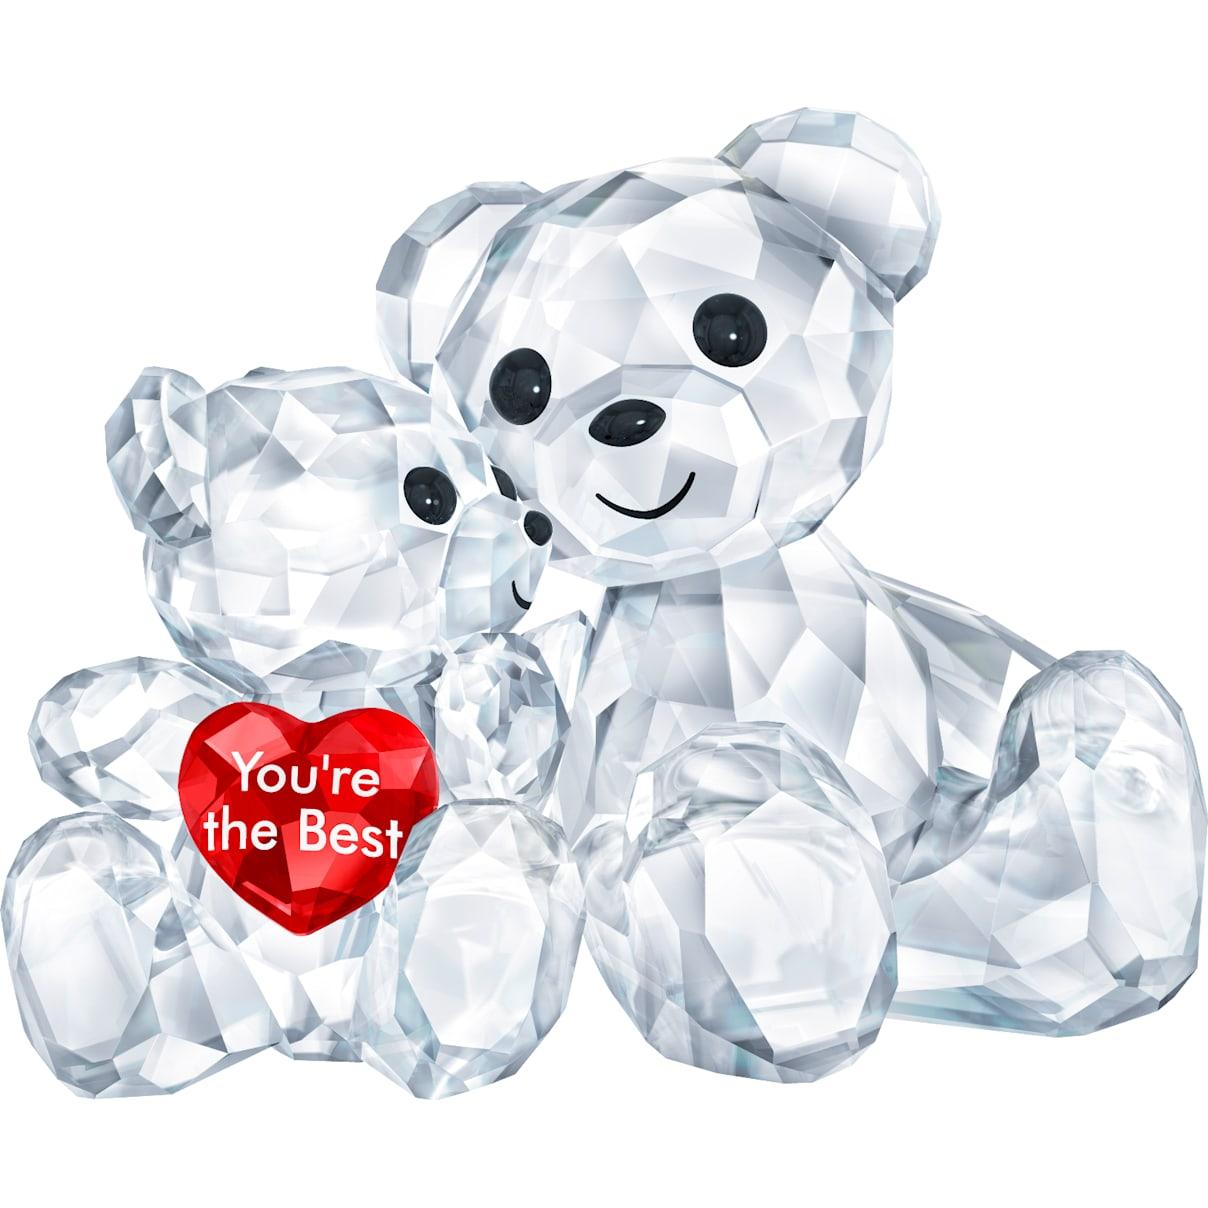 Swarovski Kris Bear - You're the Best